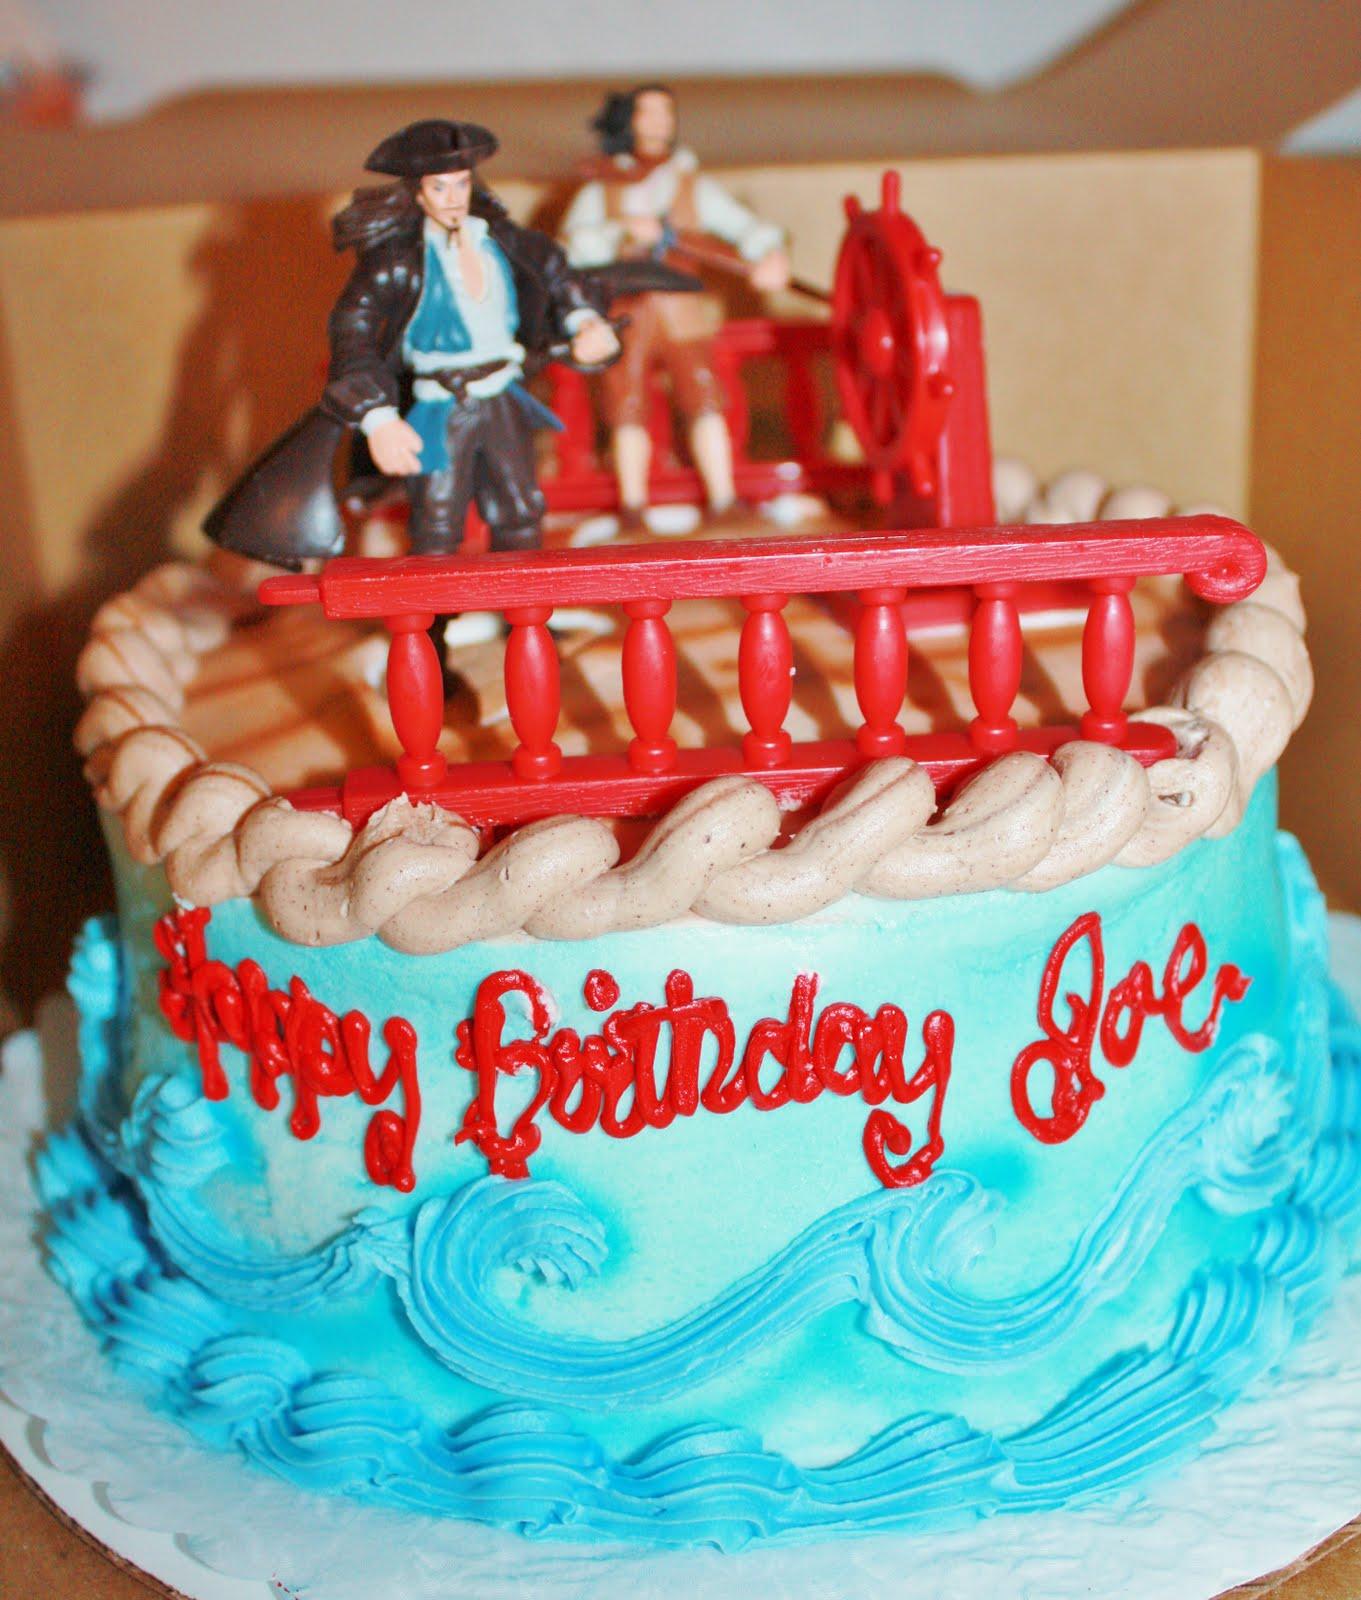 That's Life: Celebrating Joe's Birthday